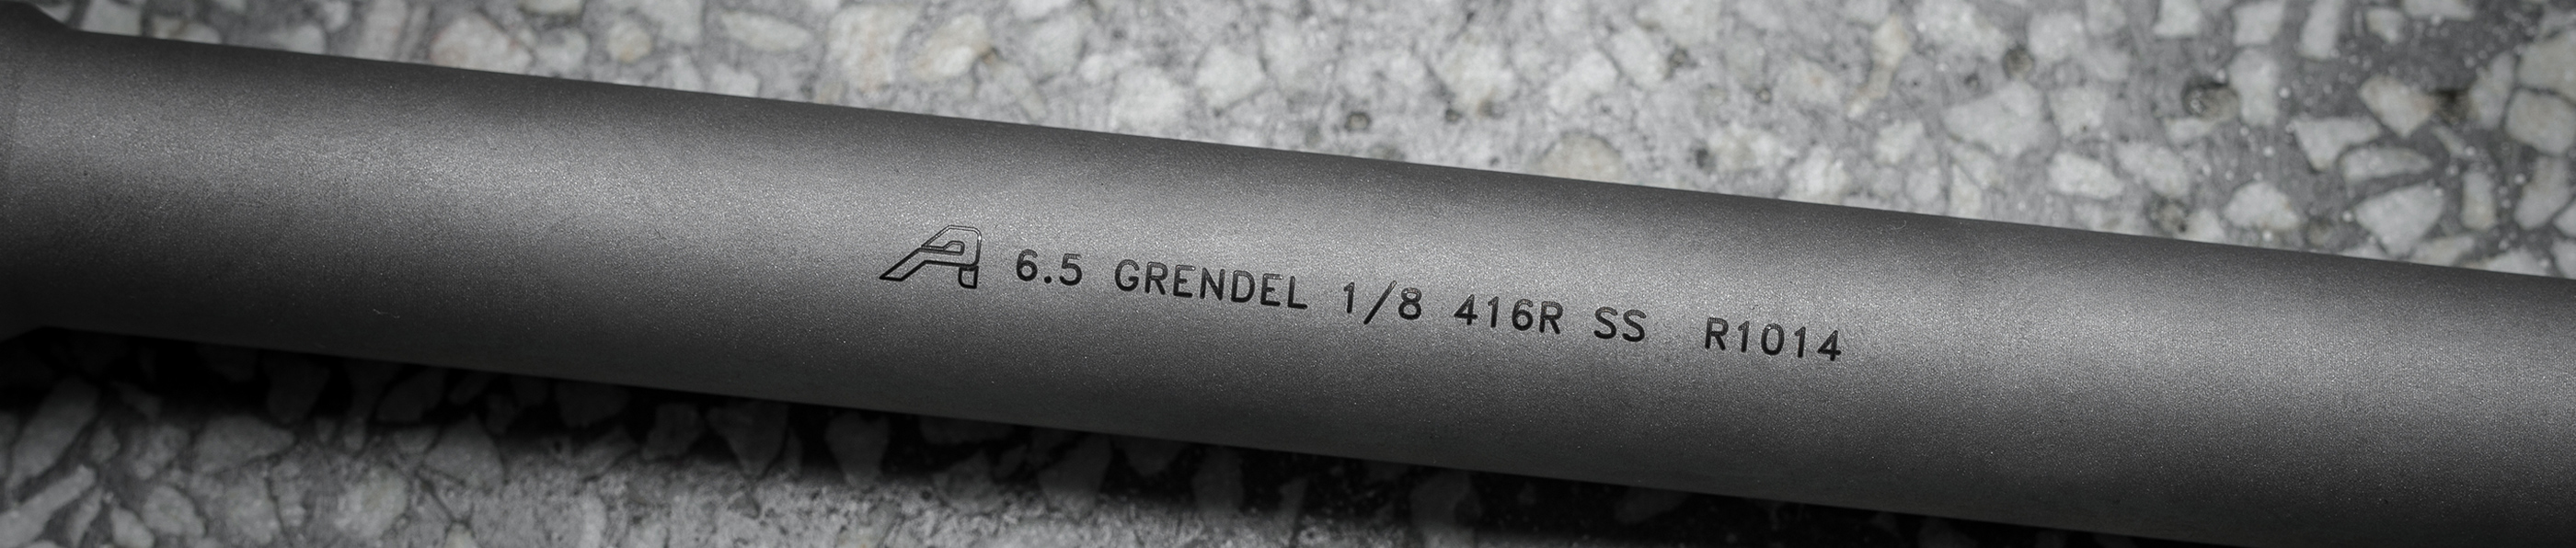 6.5 Grendel